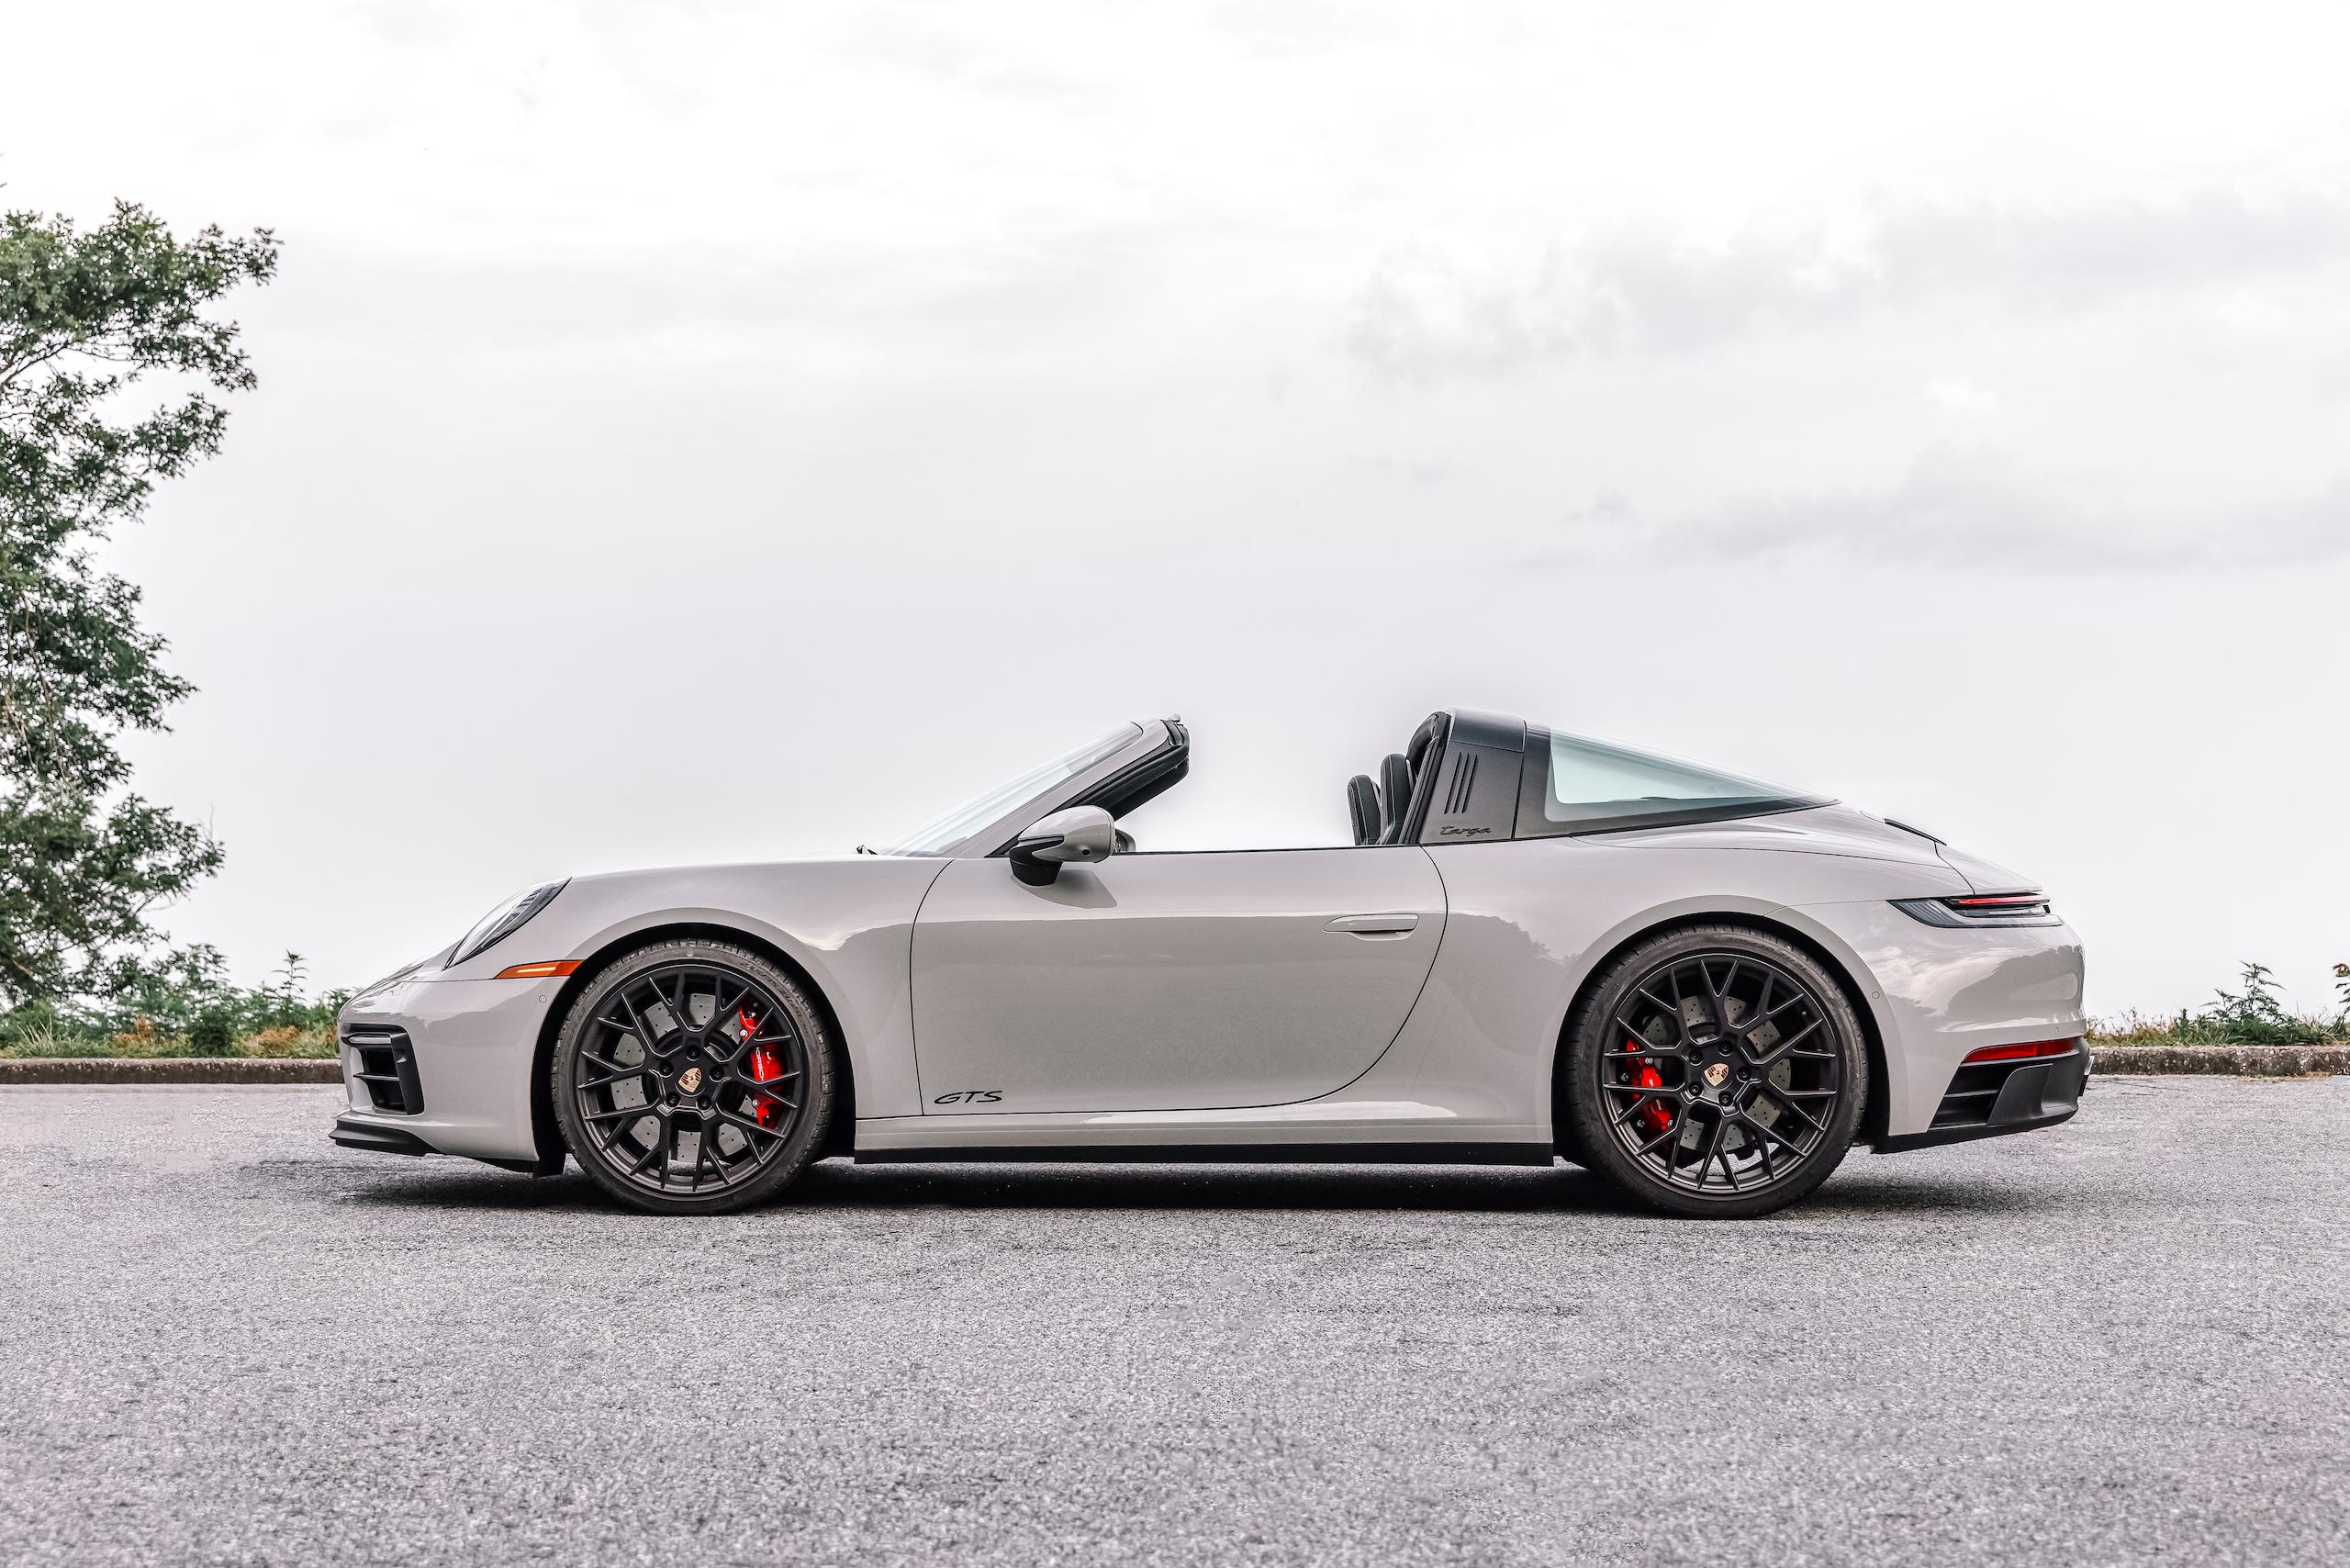 Porsche 911 Targa 4 GTS top down